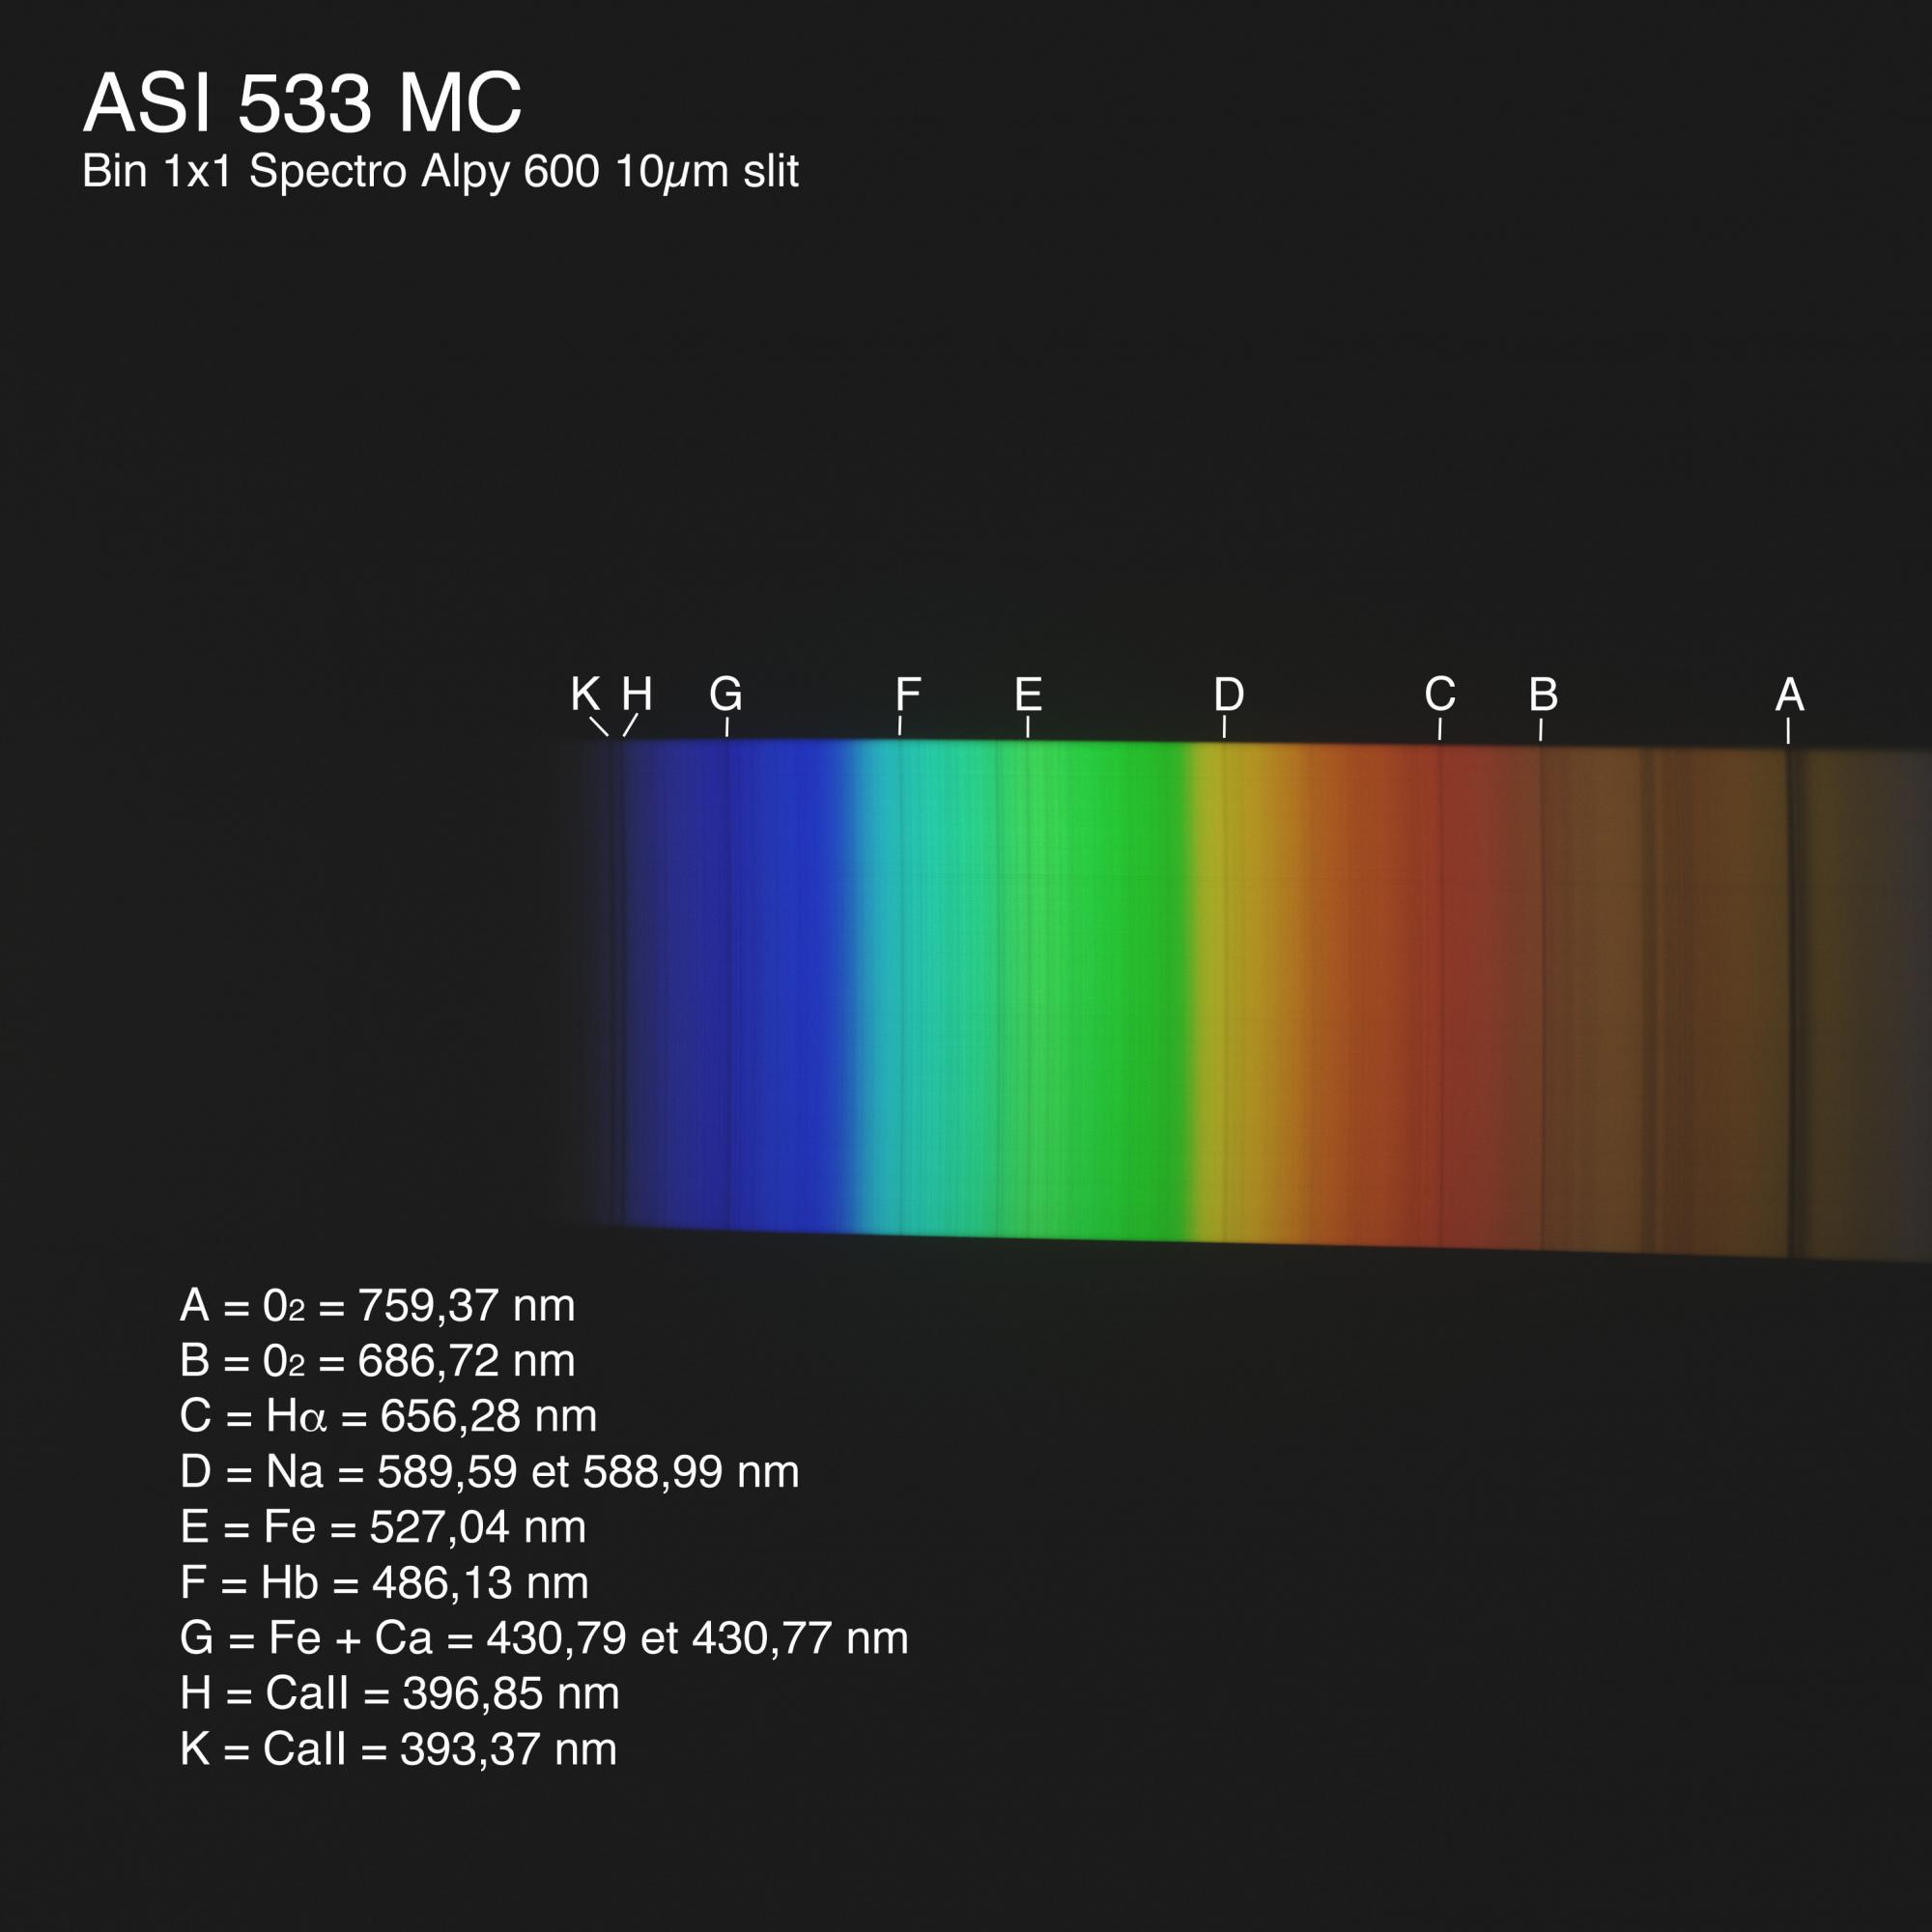 5f8b1389dc878_ASI533MCspectresolaire.thumb.jpg.654f052943b8bfb63af1fd7e29d13b23.jpg